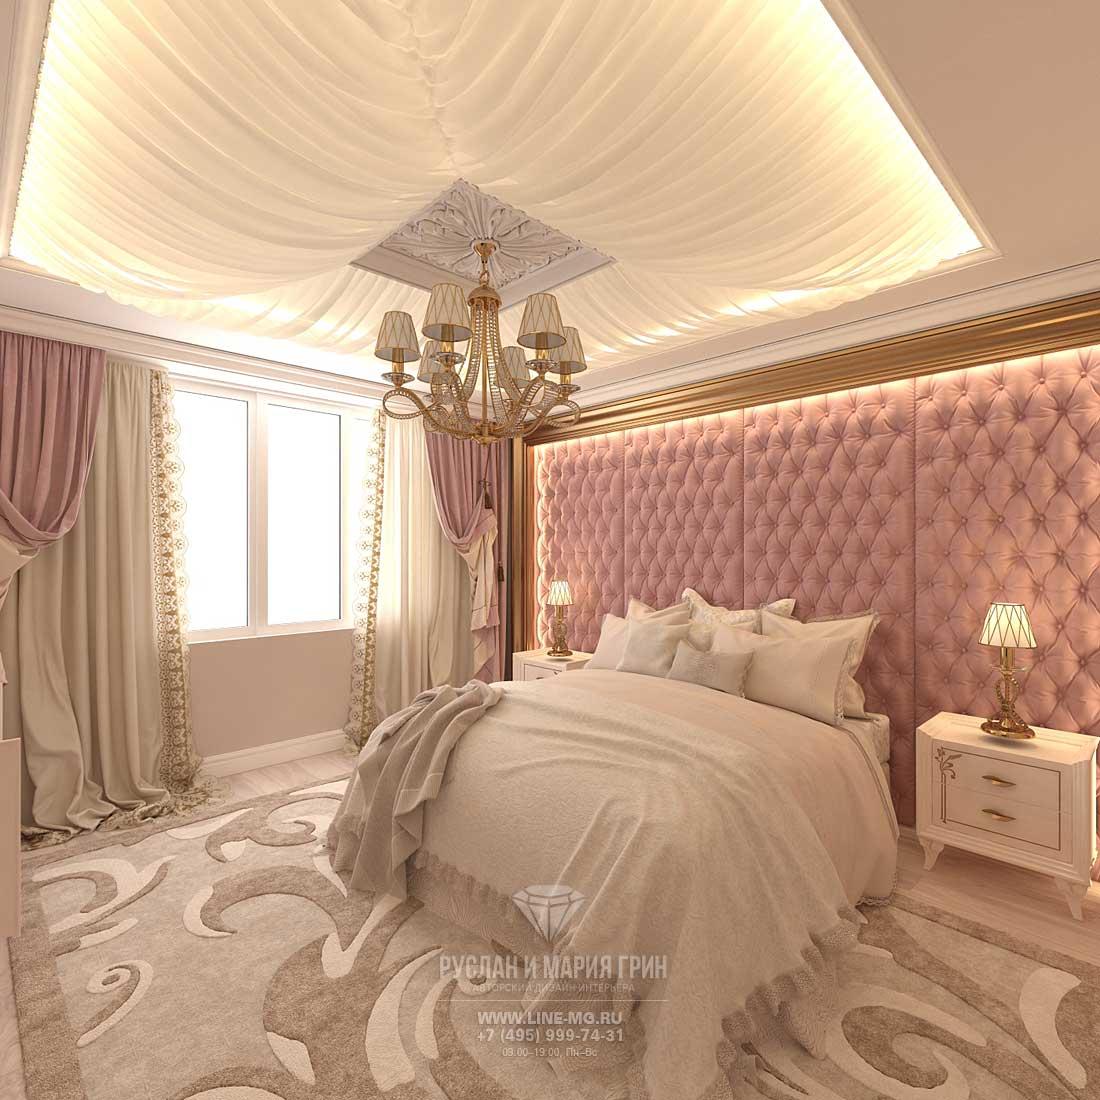 Интерьер спальни. Фото 2016